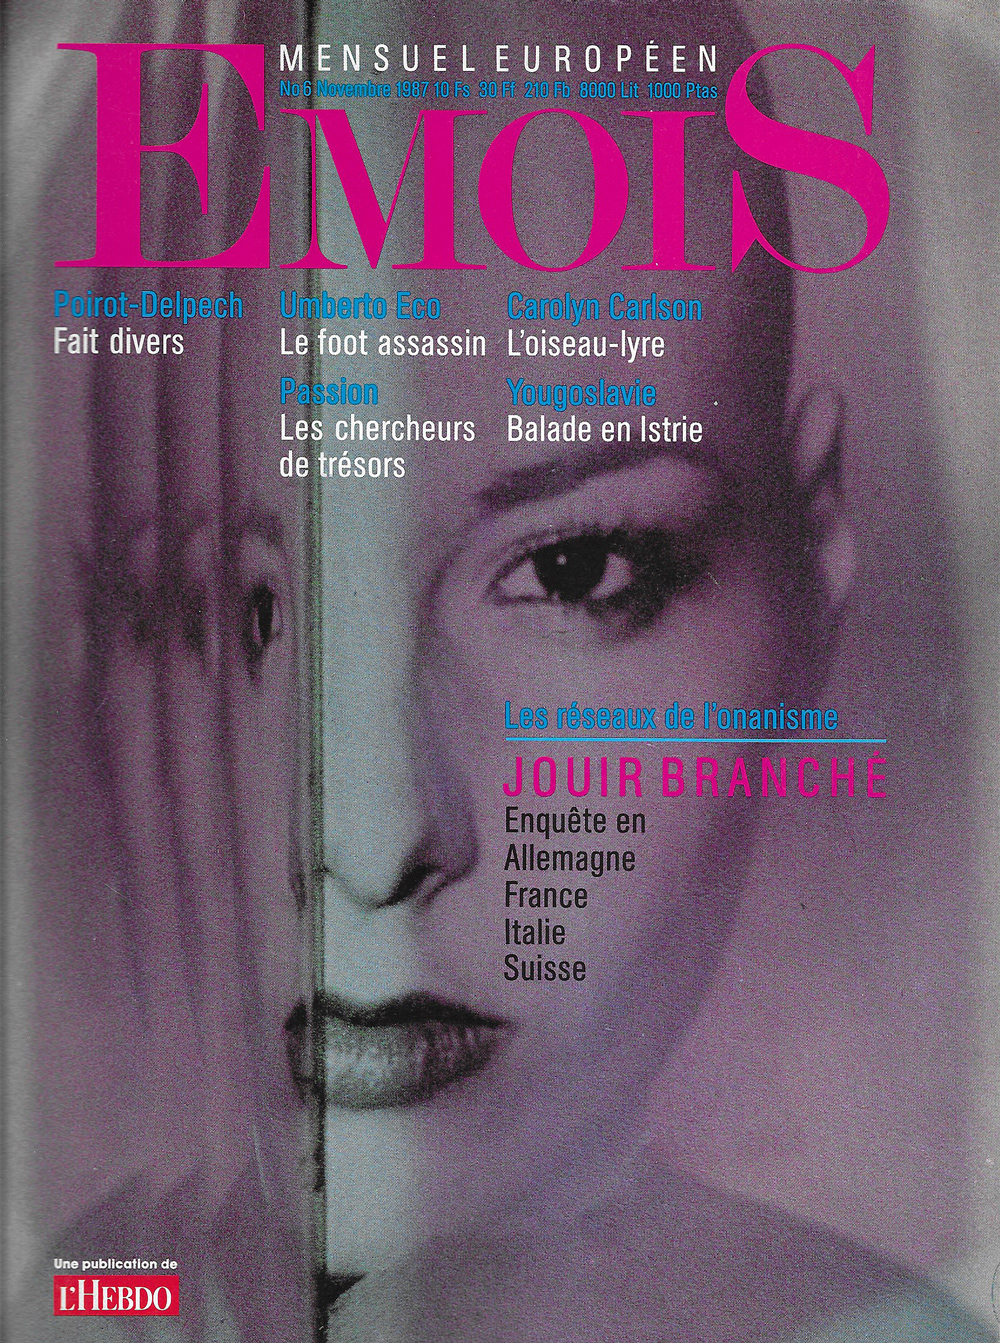 EMOIS n°6, novembre 1987